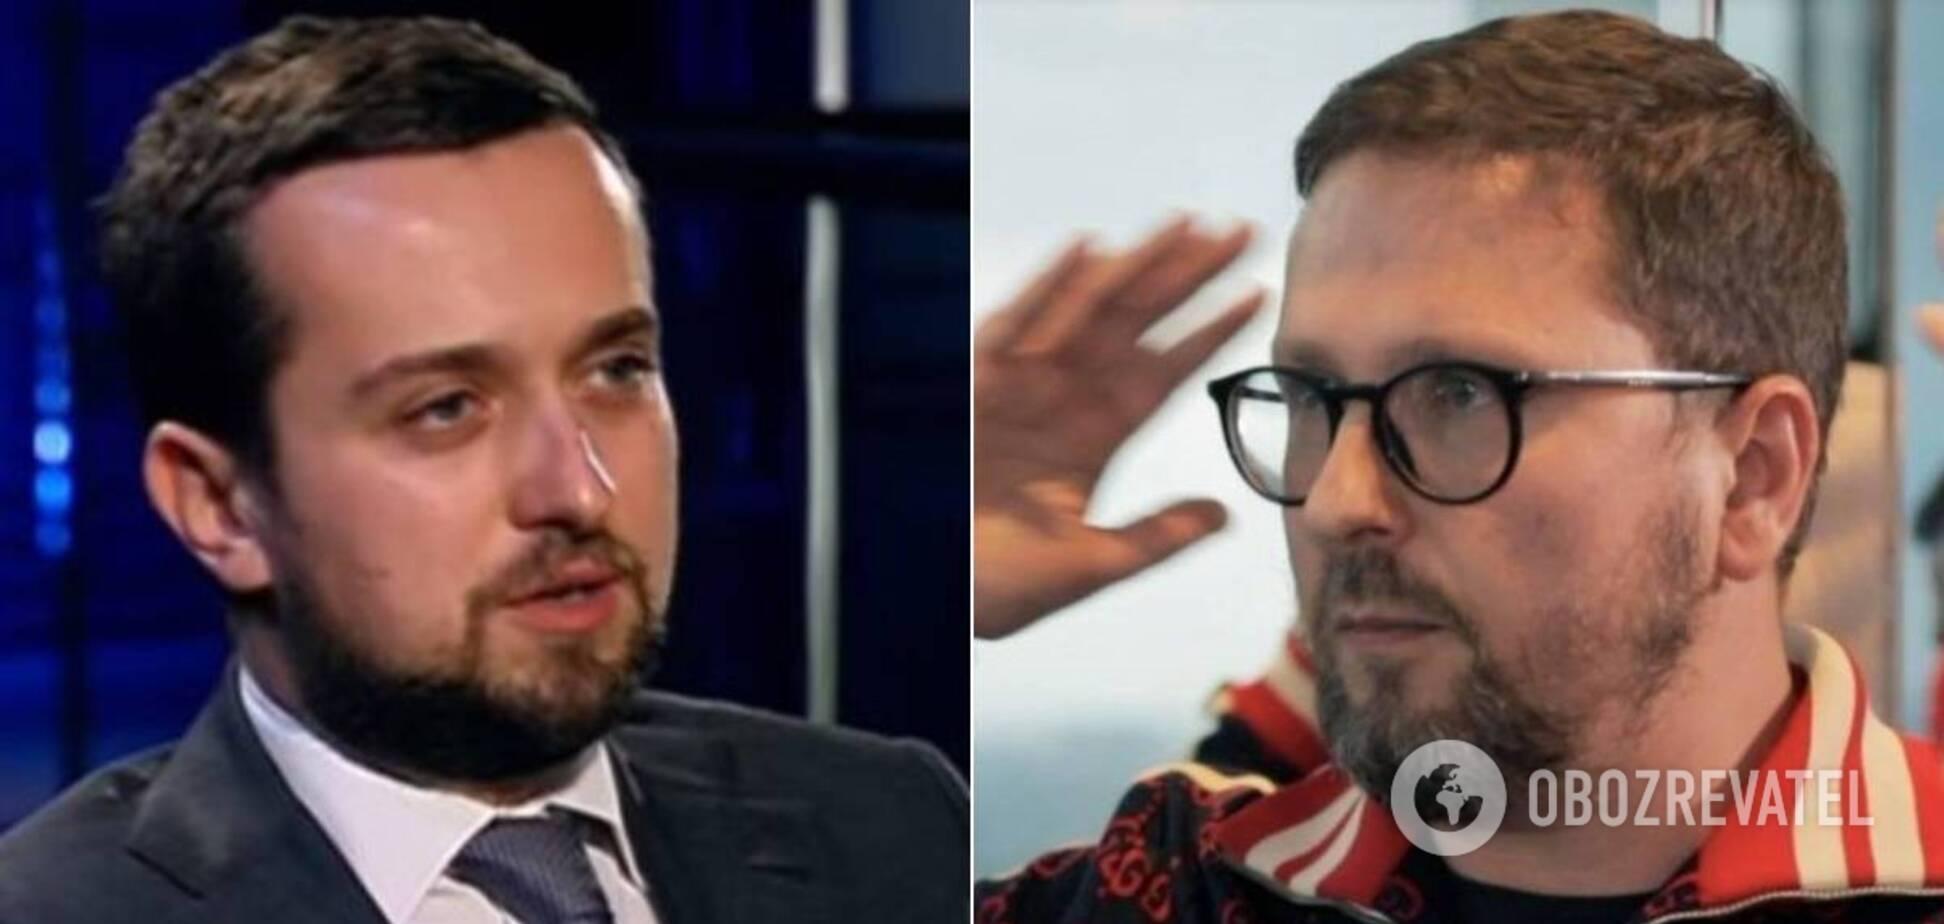 Шарий подтвердил данные об атаке помощника Тимошенко на OBOZREVATEL